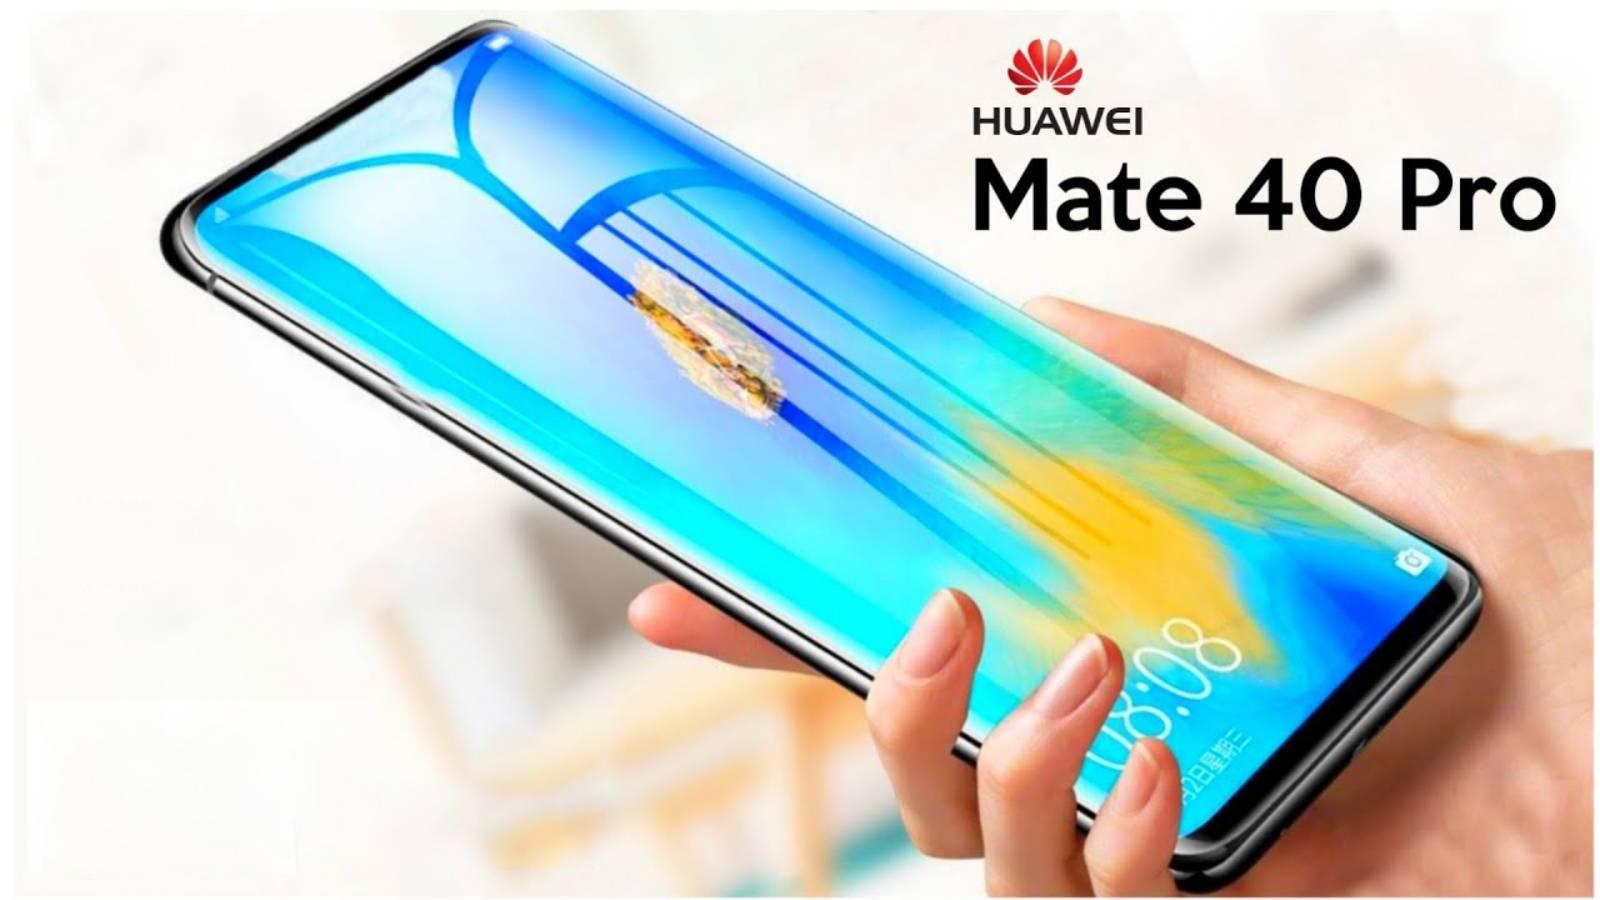 Huawei MATE 40 Pro schimbare iphone 12